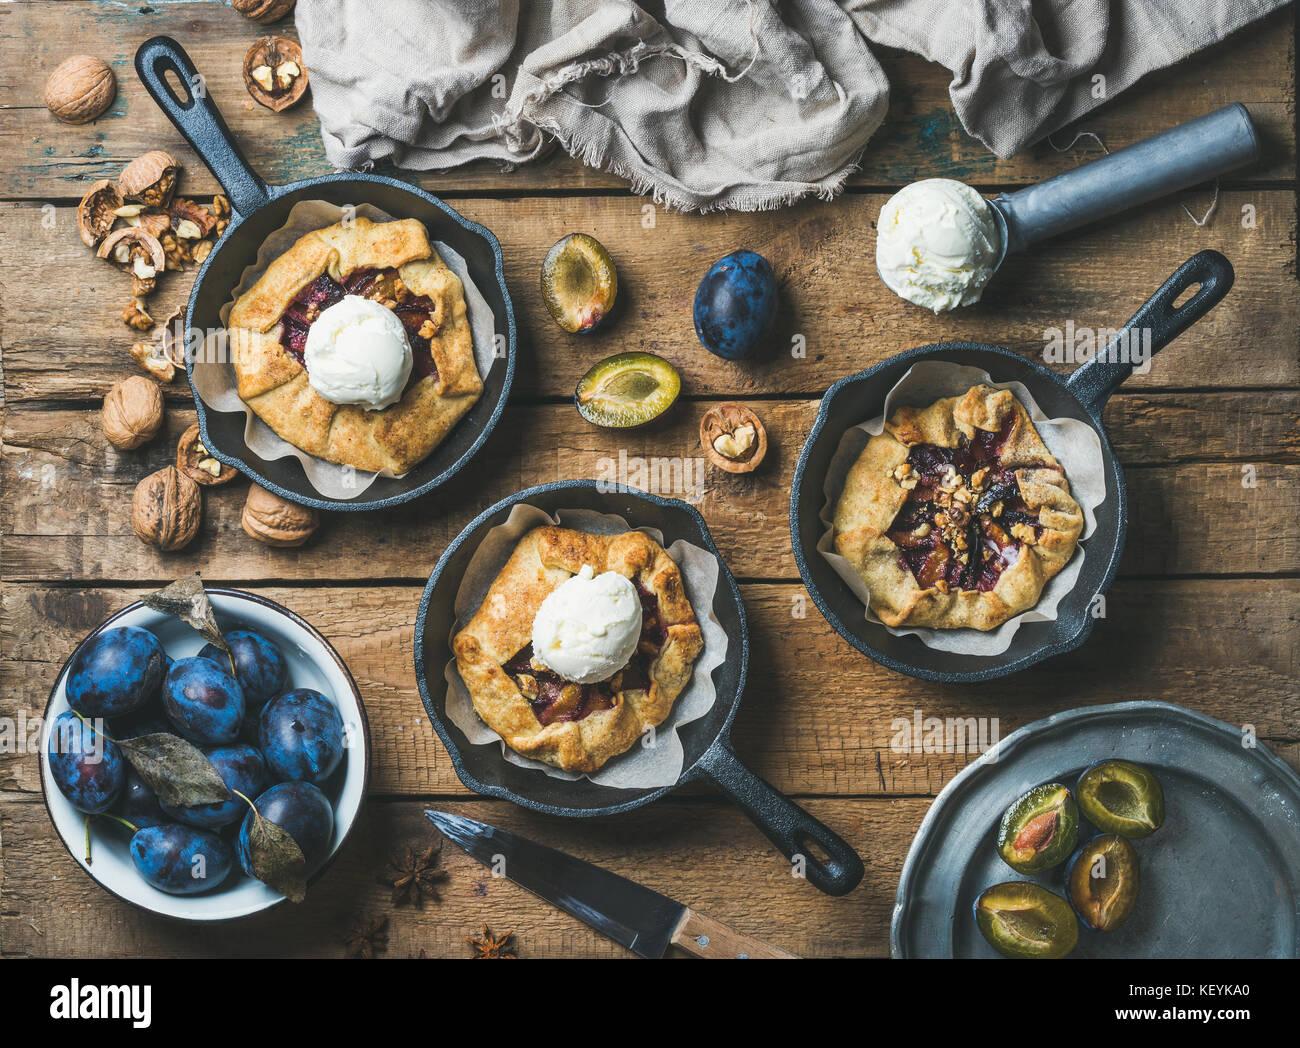 Plum and walnut crostata pie with ice-cream scoops - Stock Image